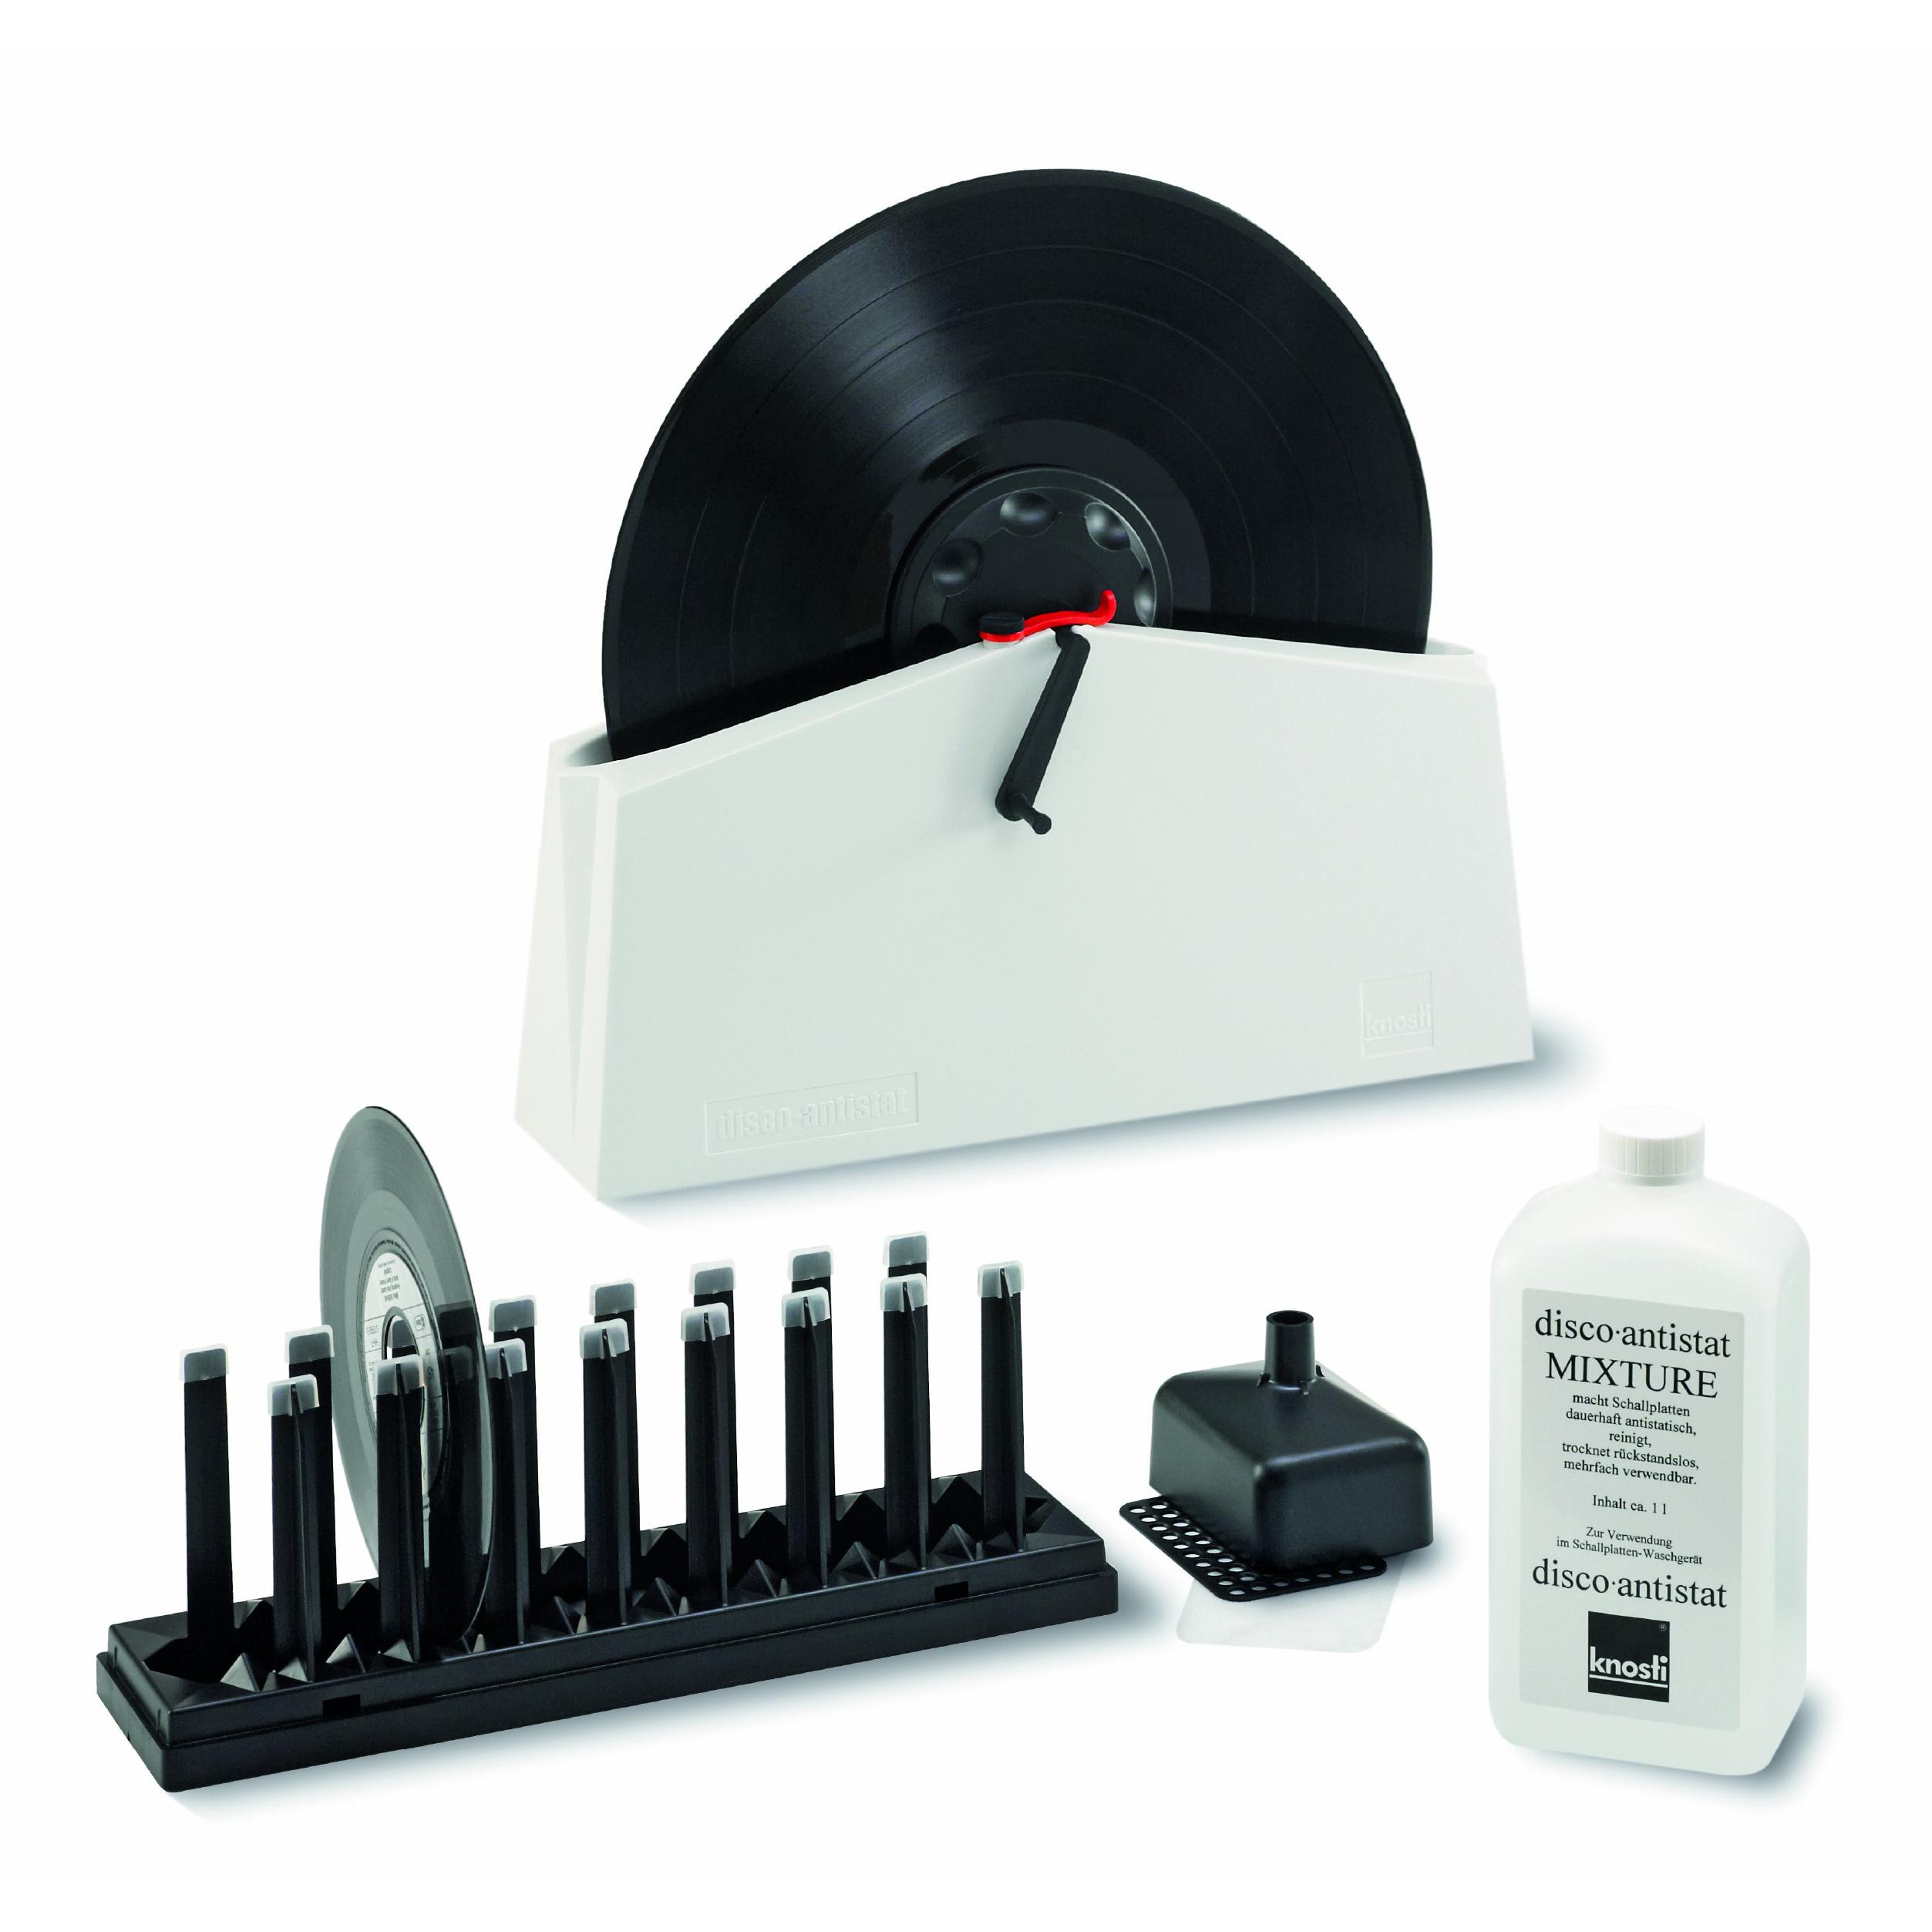 knosti disco antistat generation II platenwasmachine